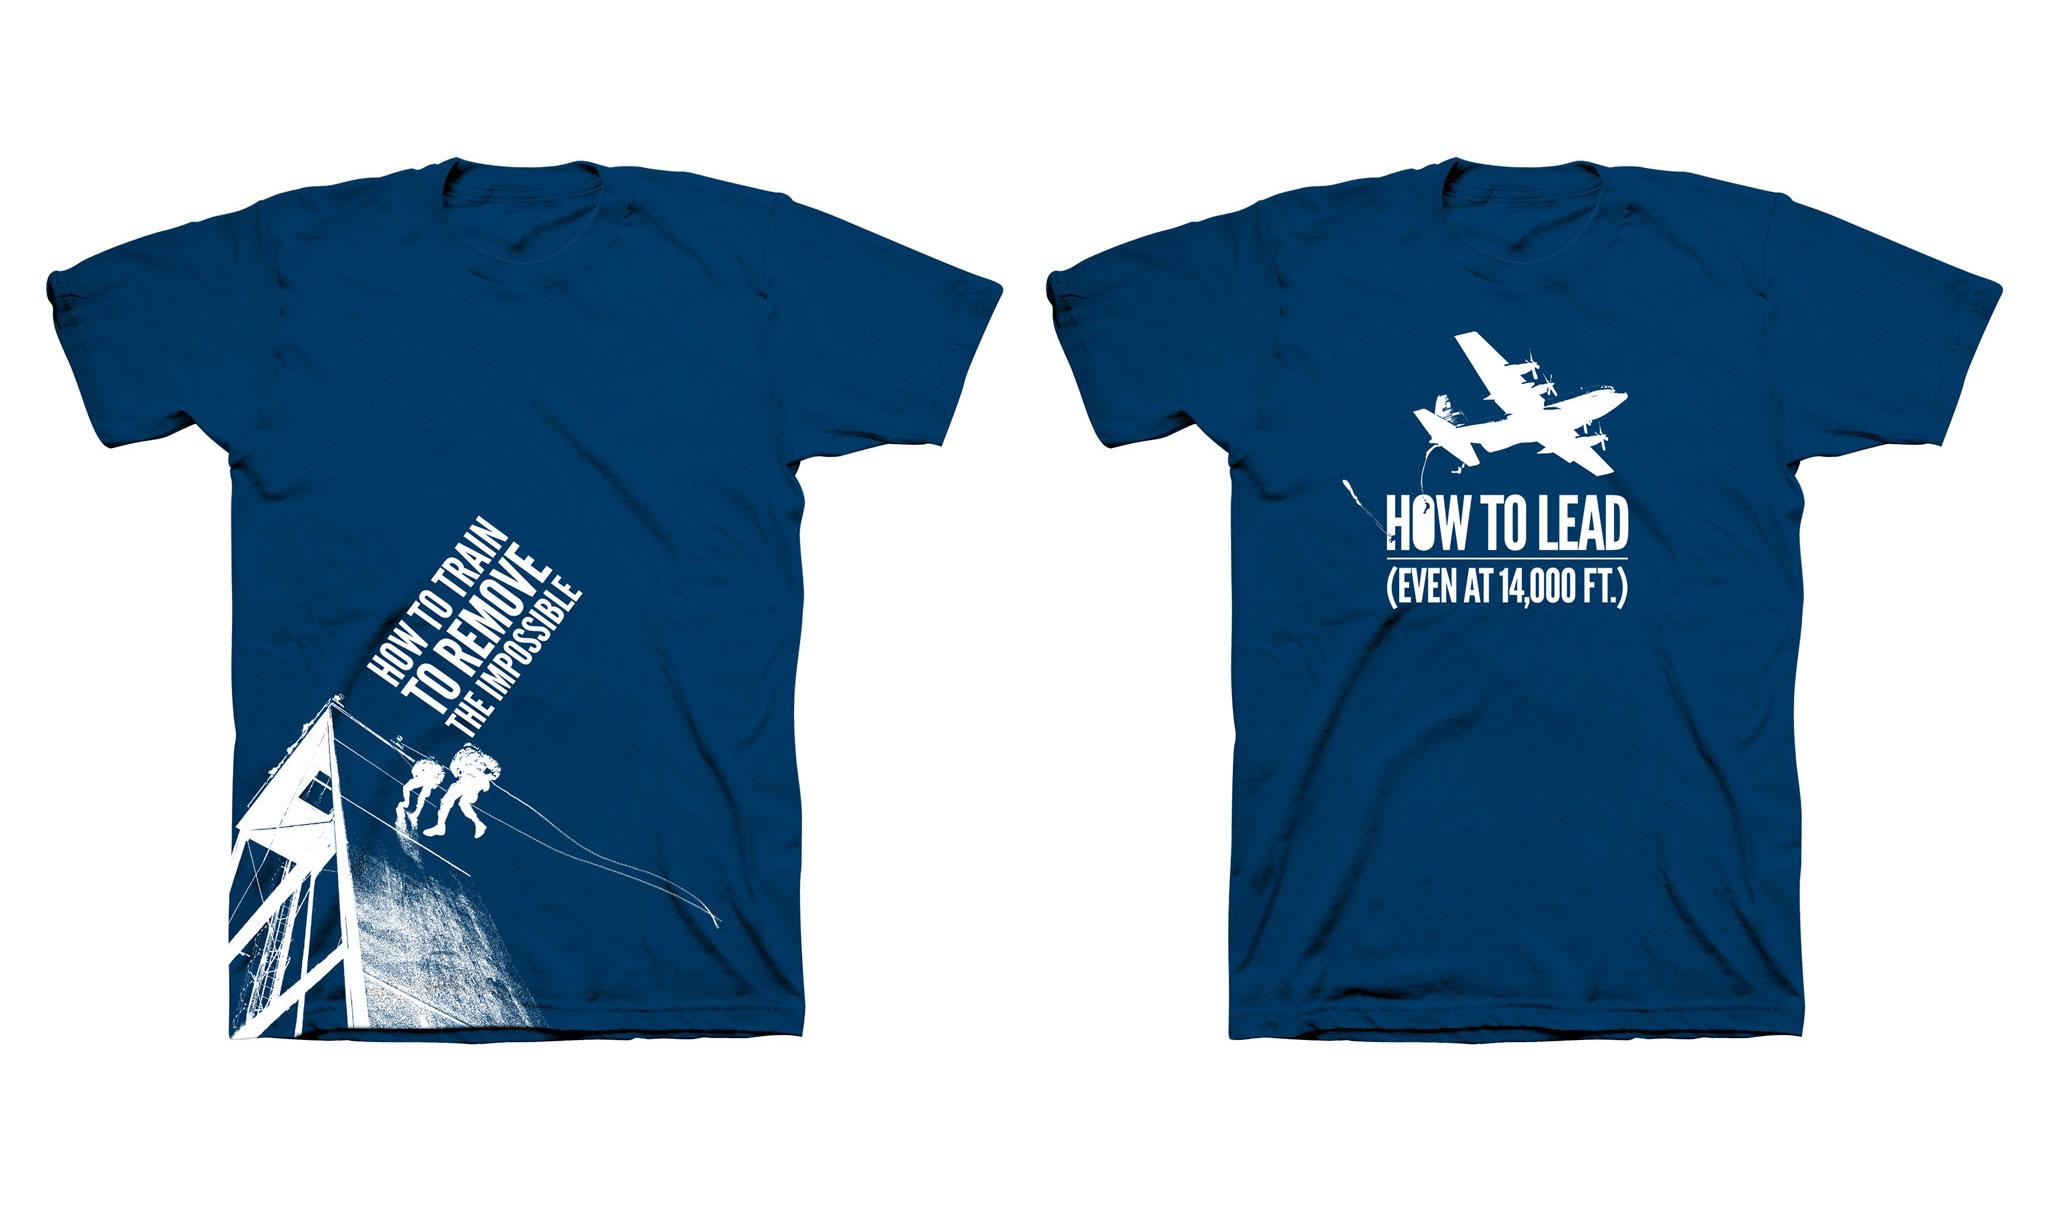 SEALs_Images_T-Shirts